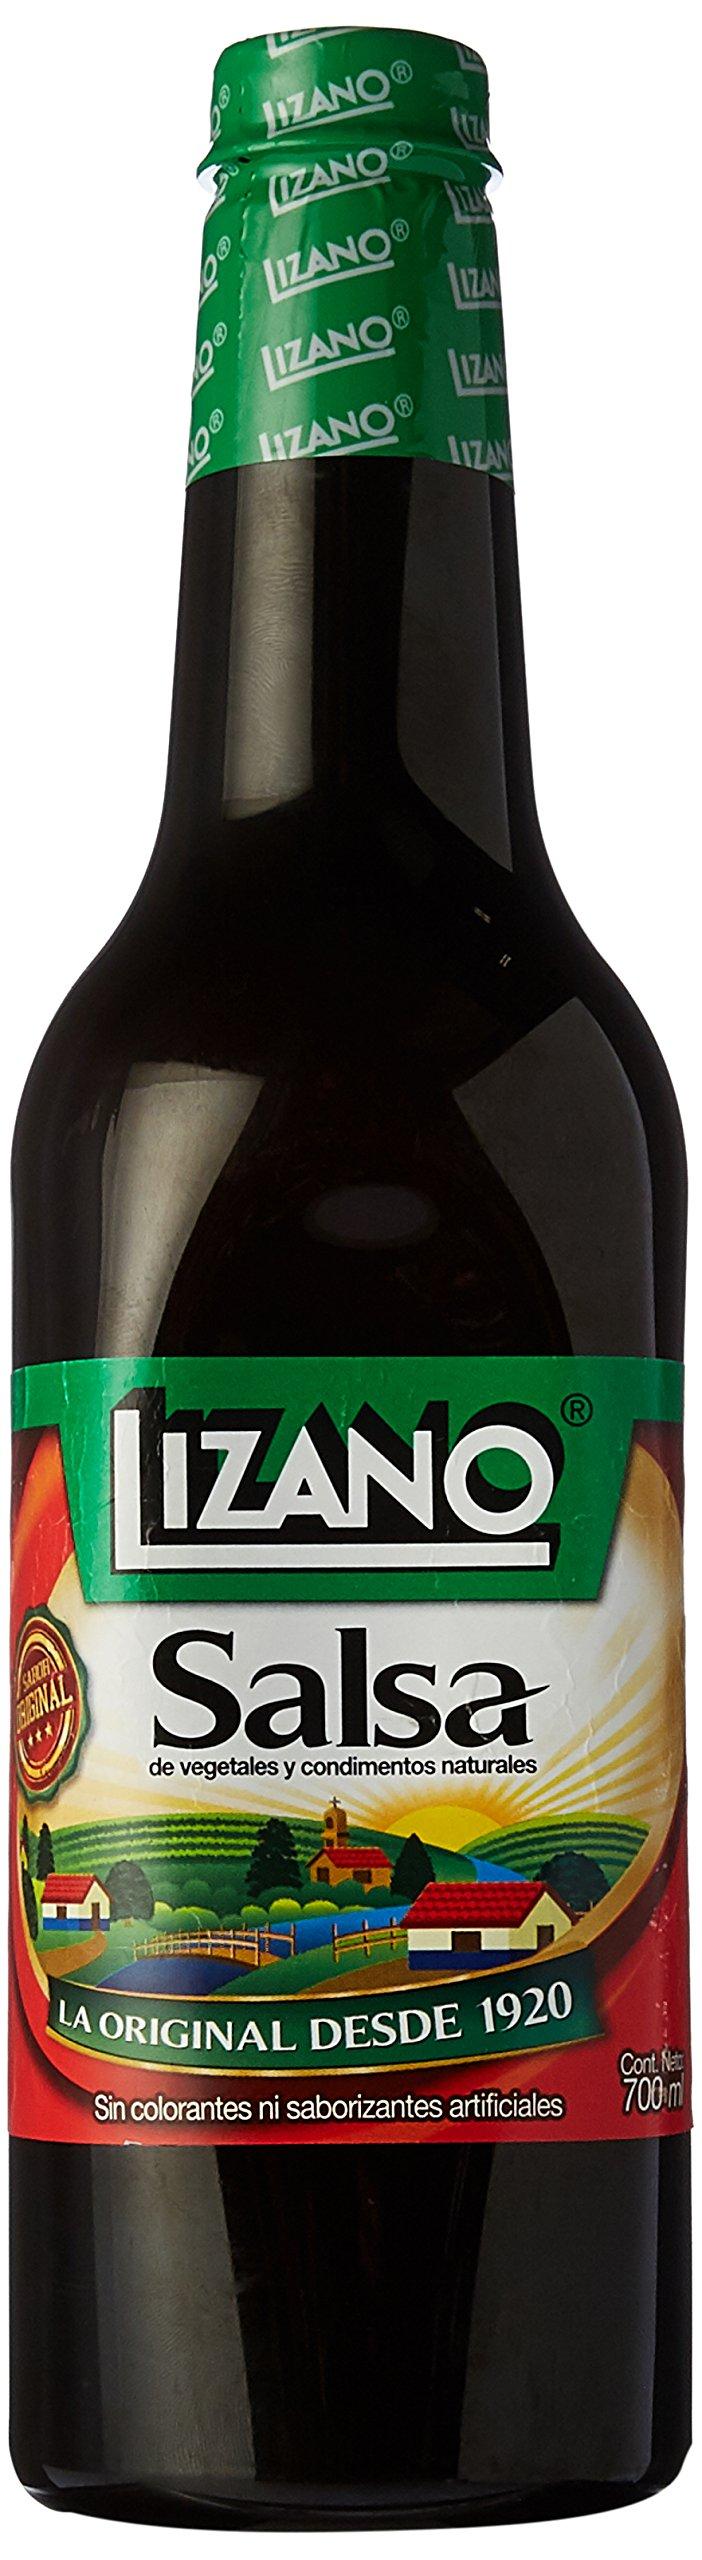 Salsa Lizano 700 ml 3-pack by Lizano